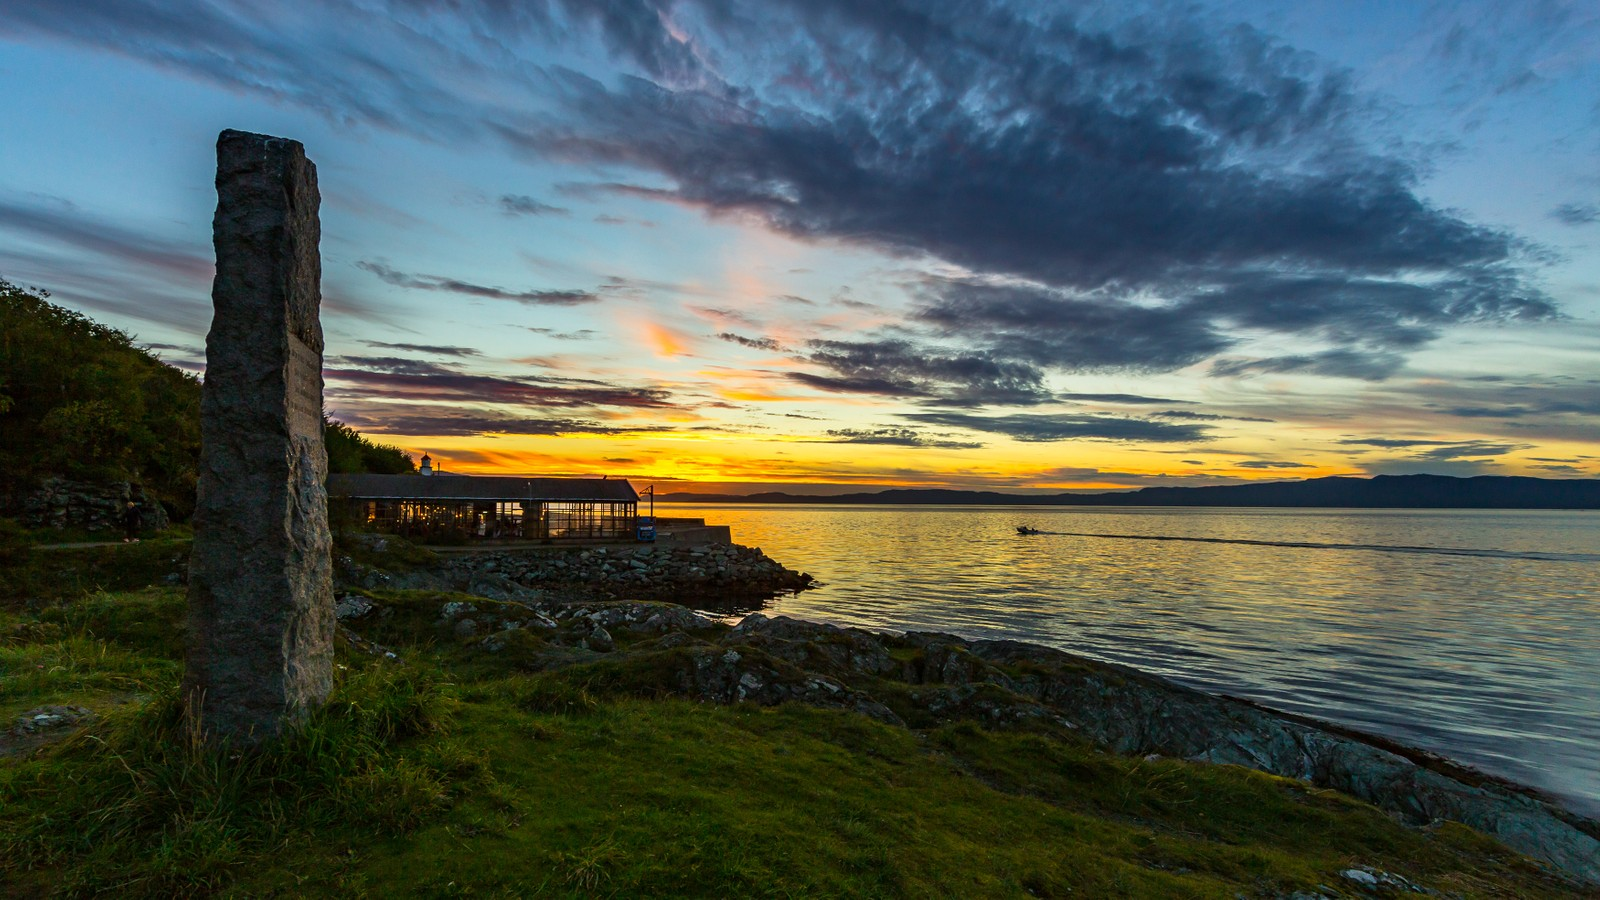 Solnedgang i Djupvika, Trondheim